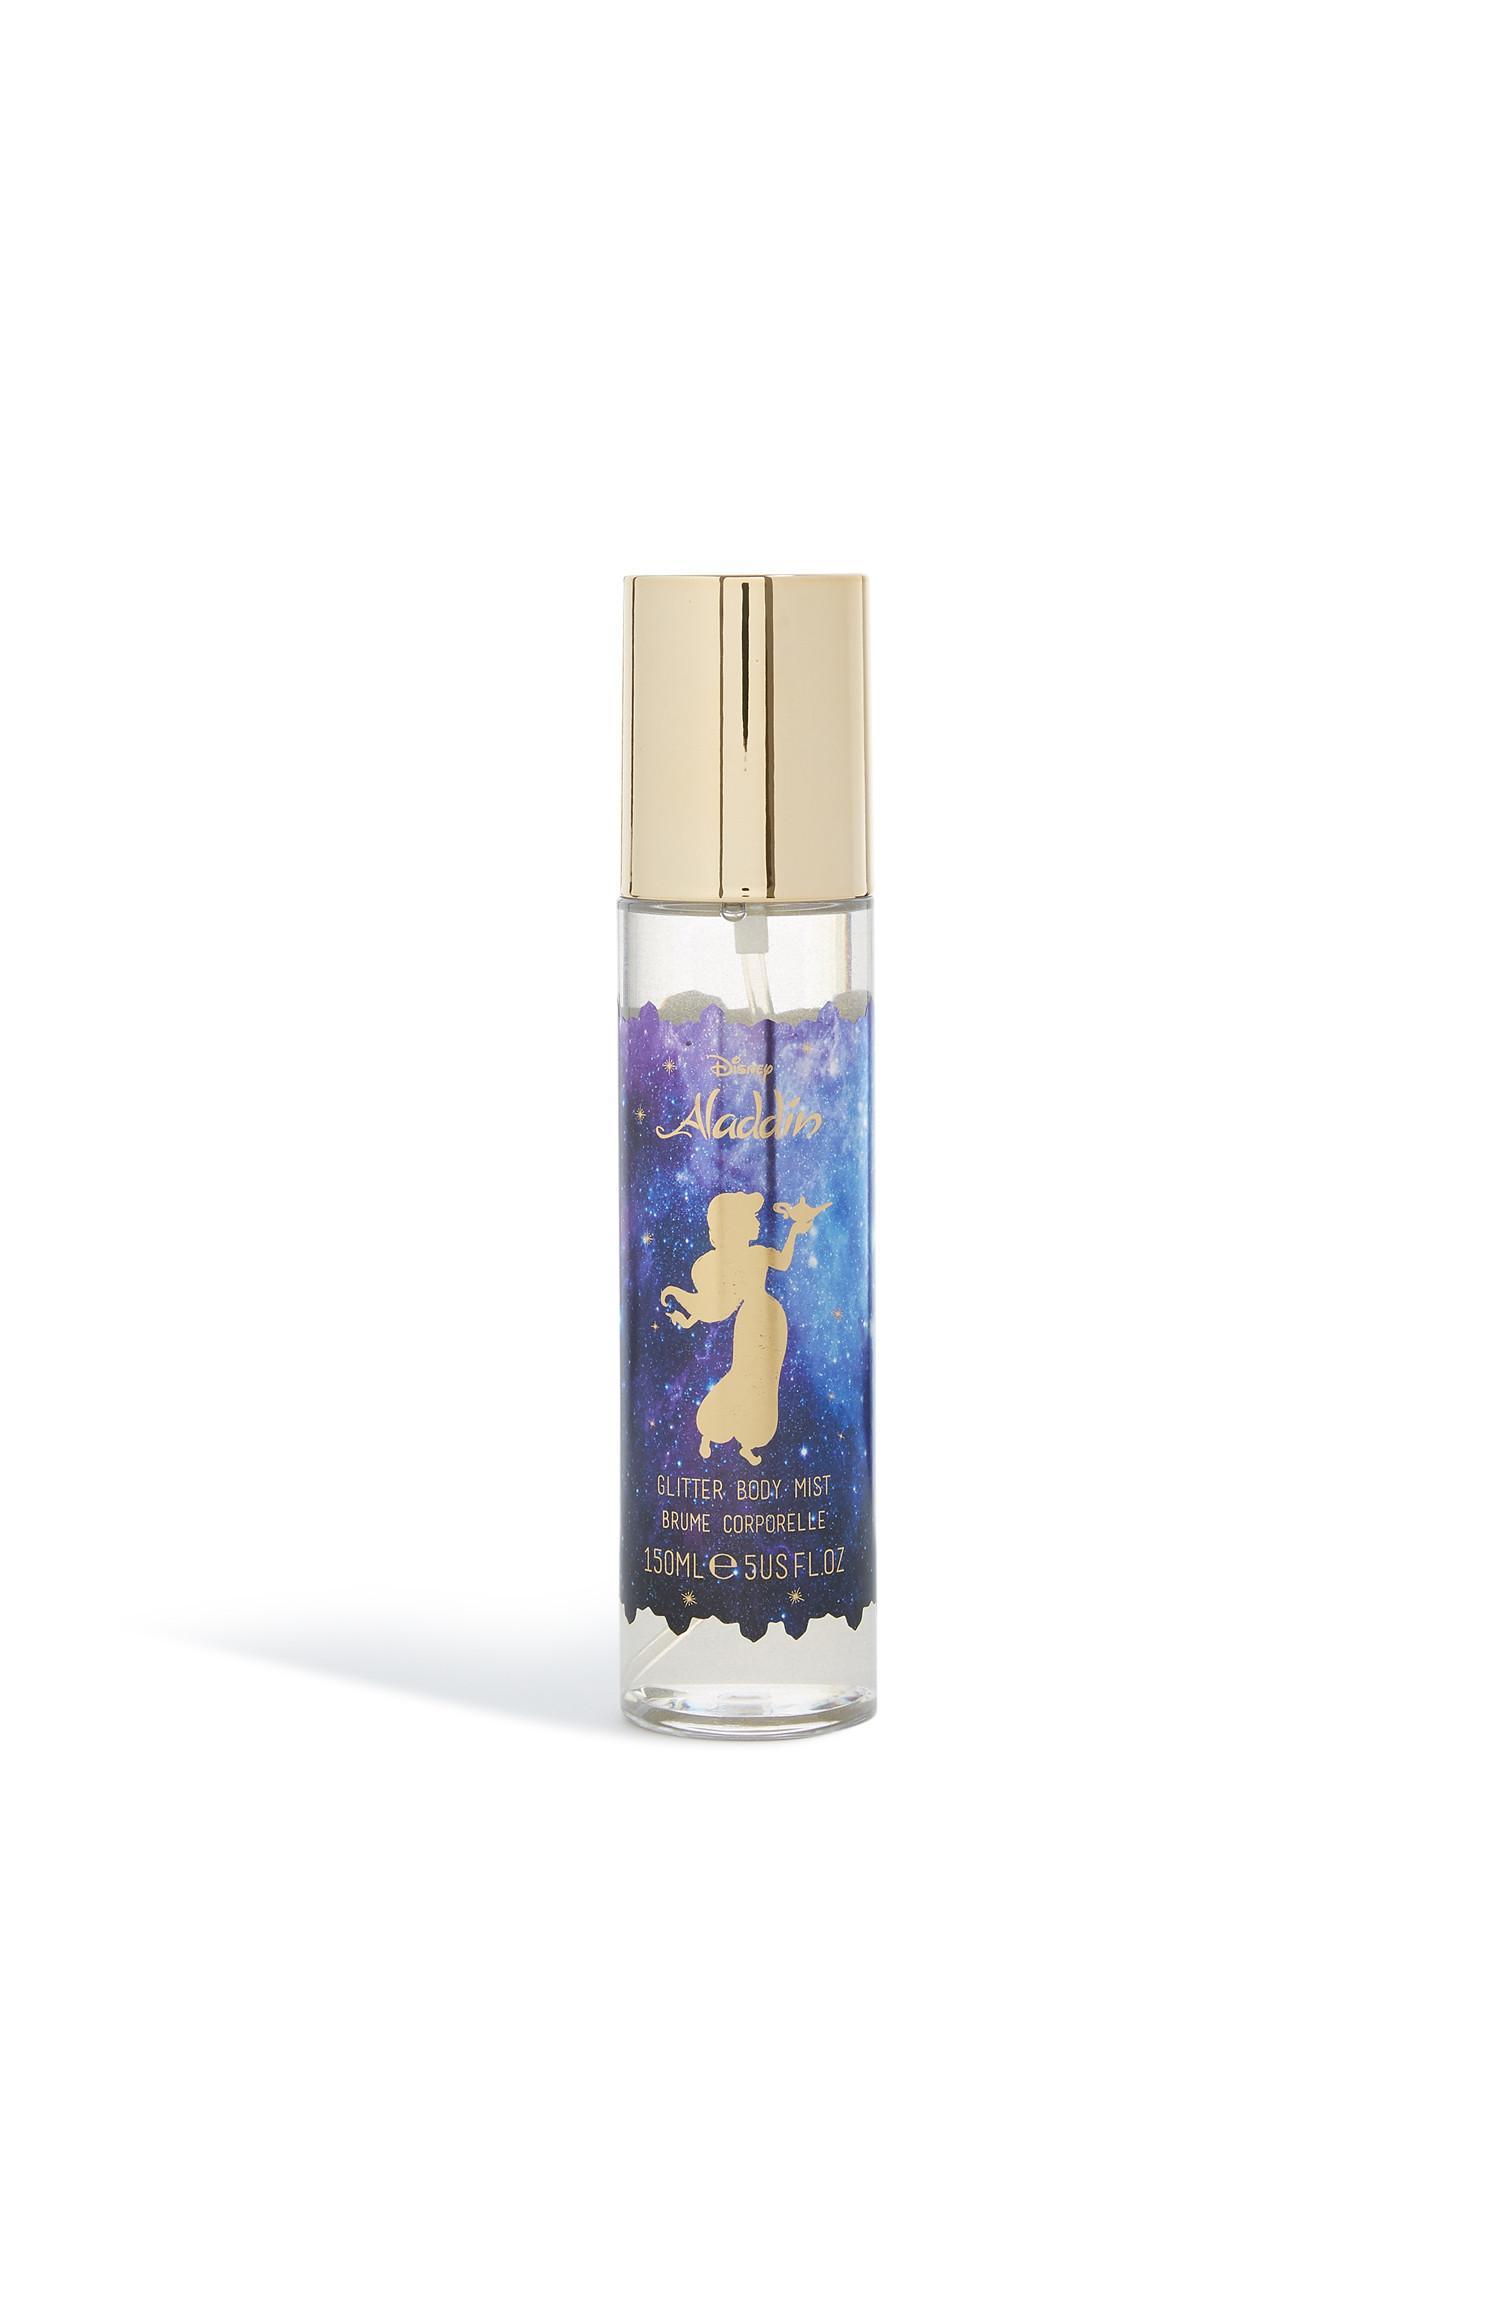 Aladdin Glitter Body Mist